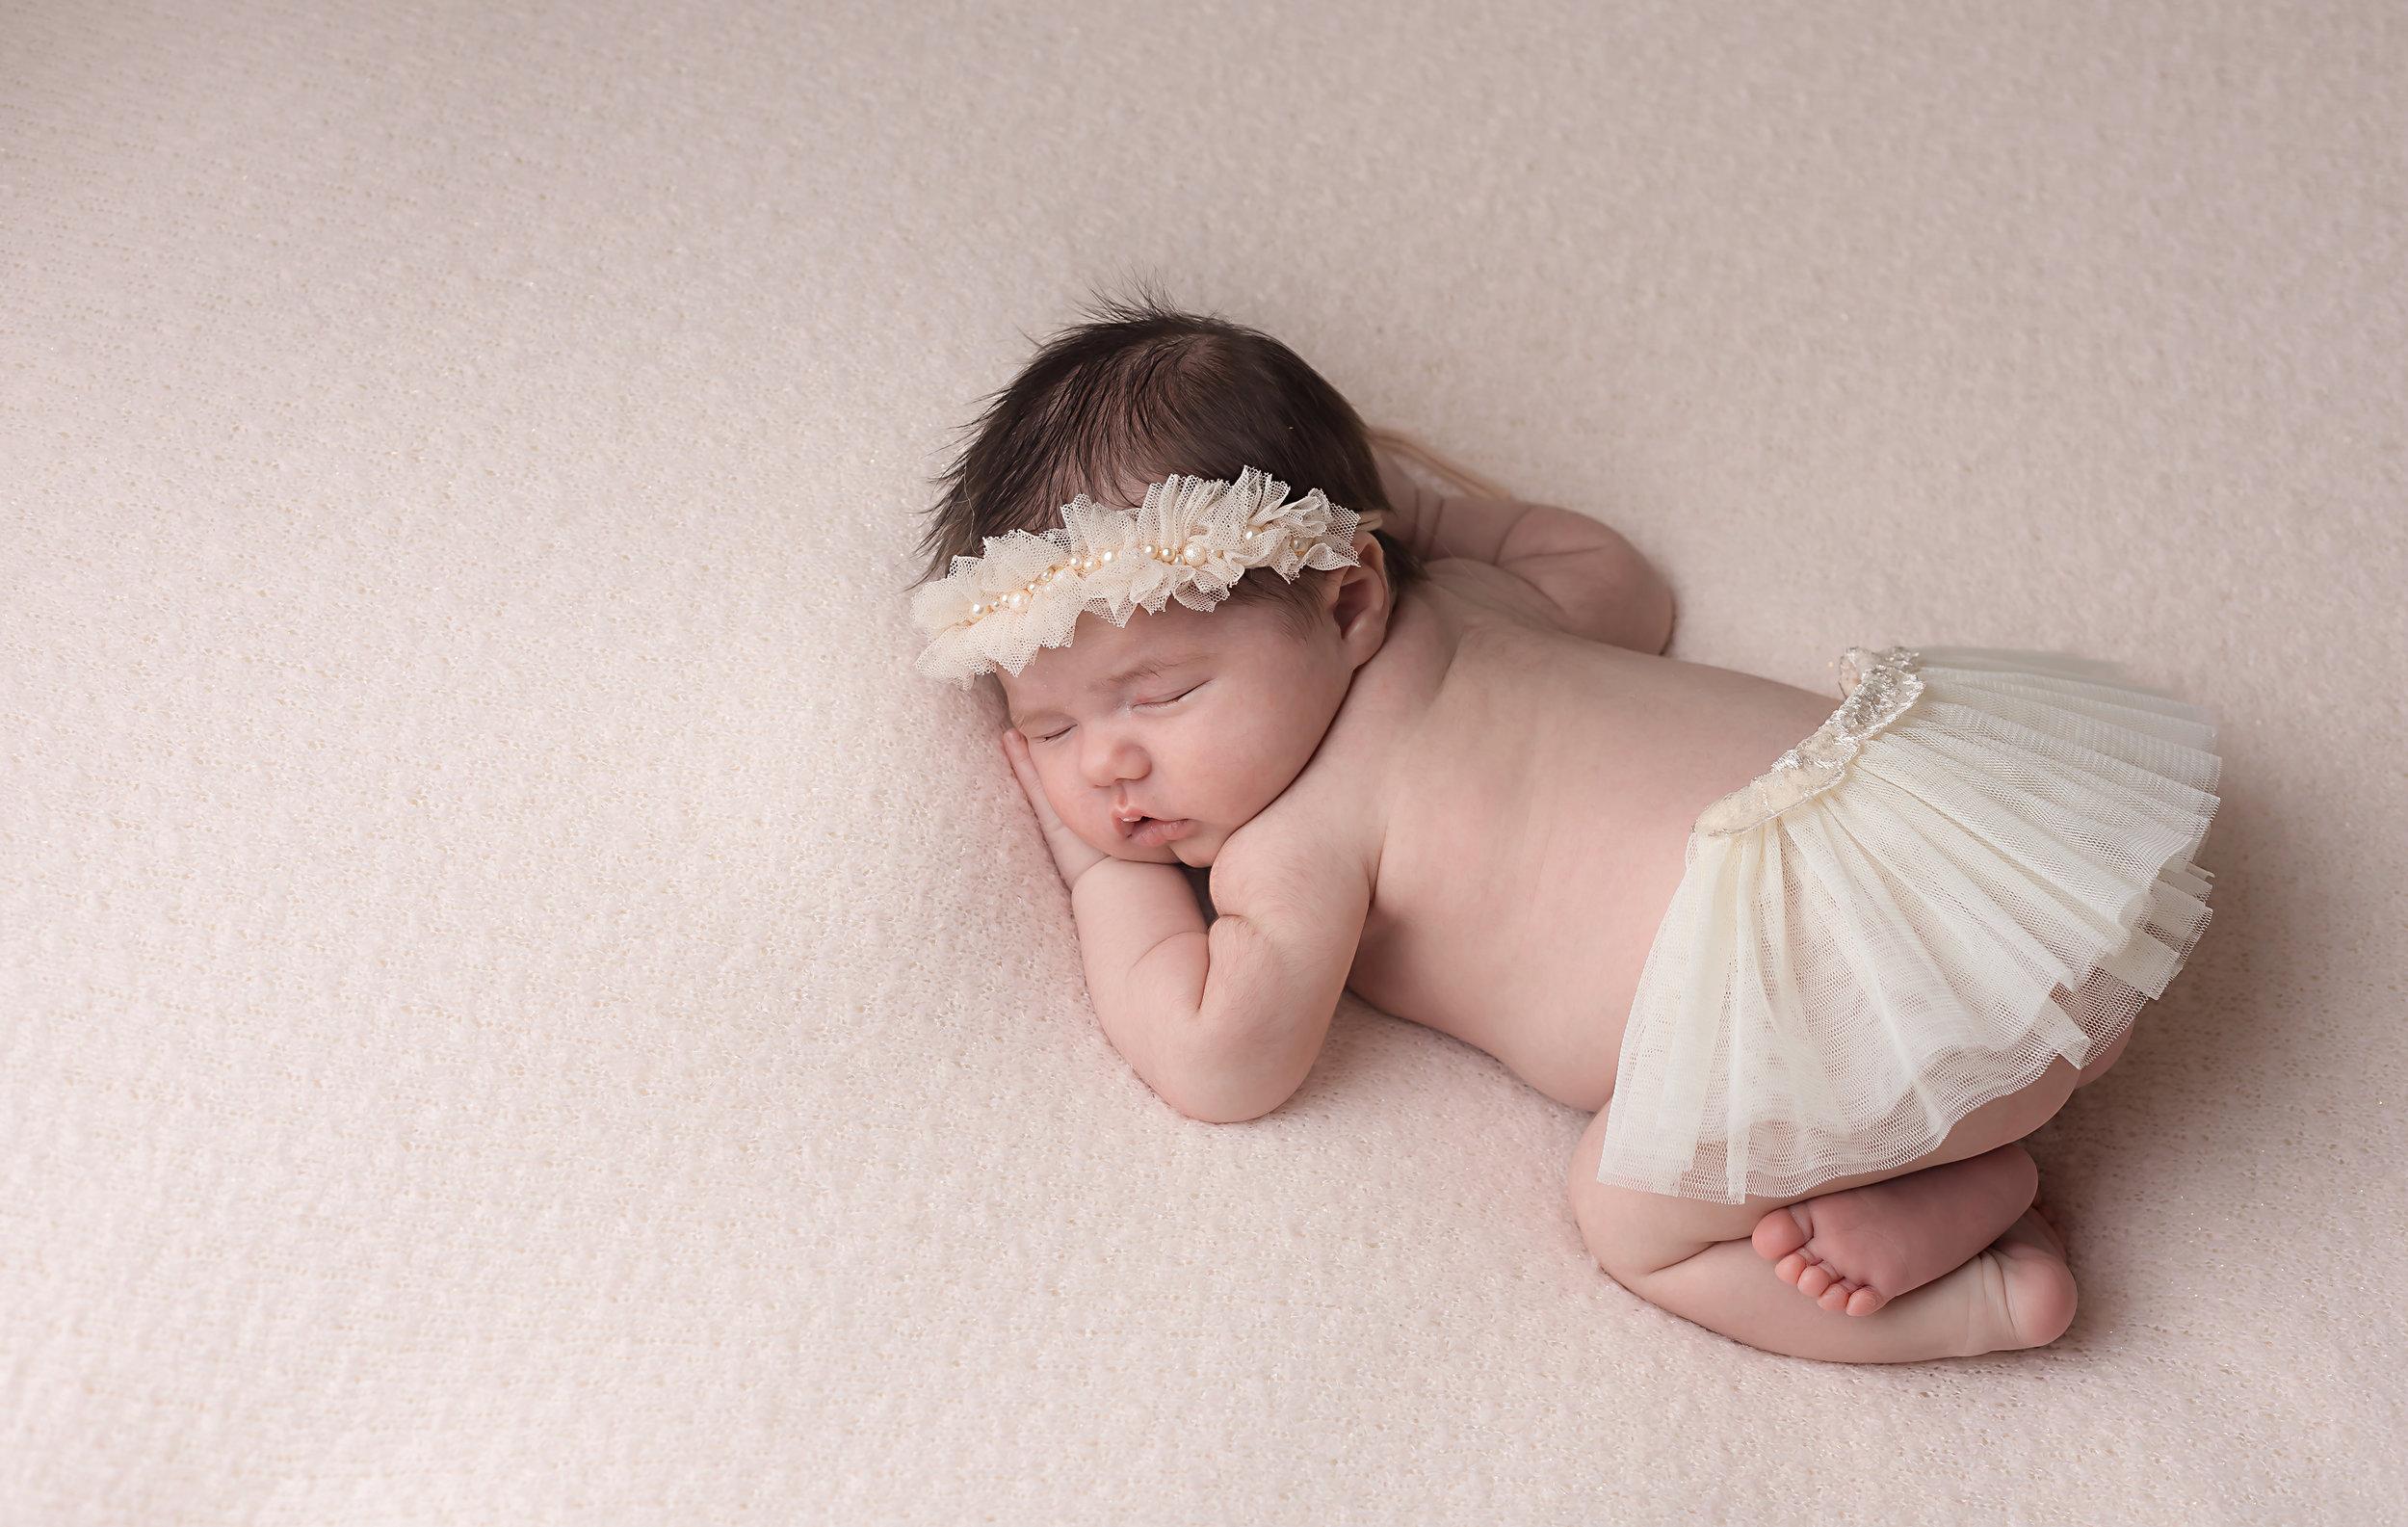 Danirosephotography.newbornphotographeraberdeen.babyphotography.5.jpg